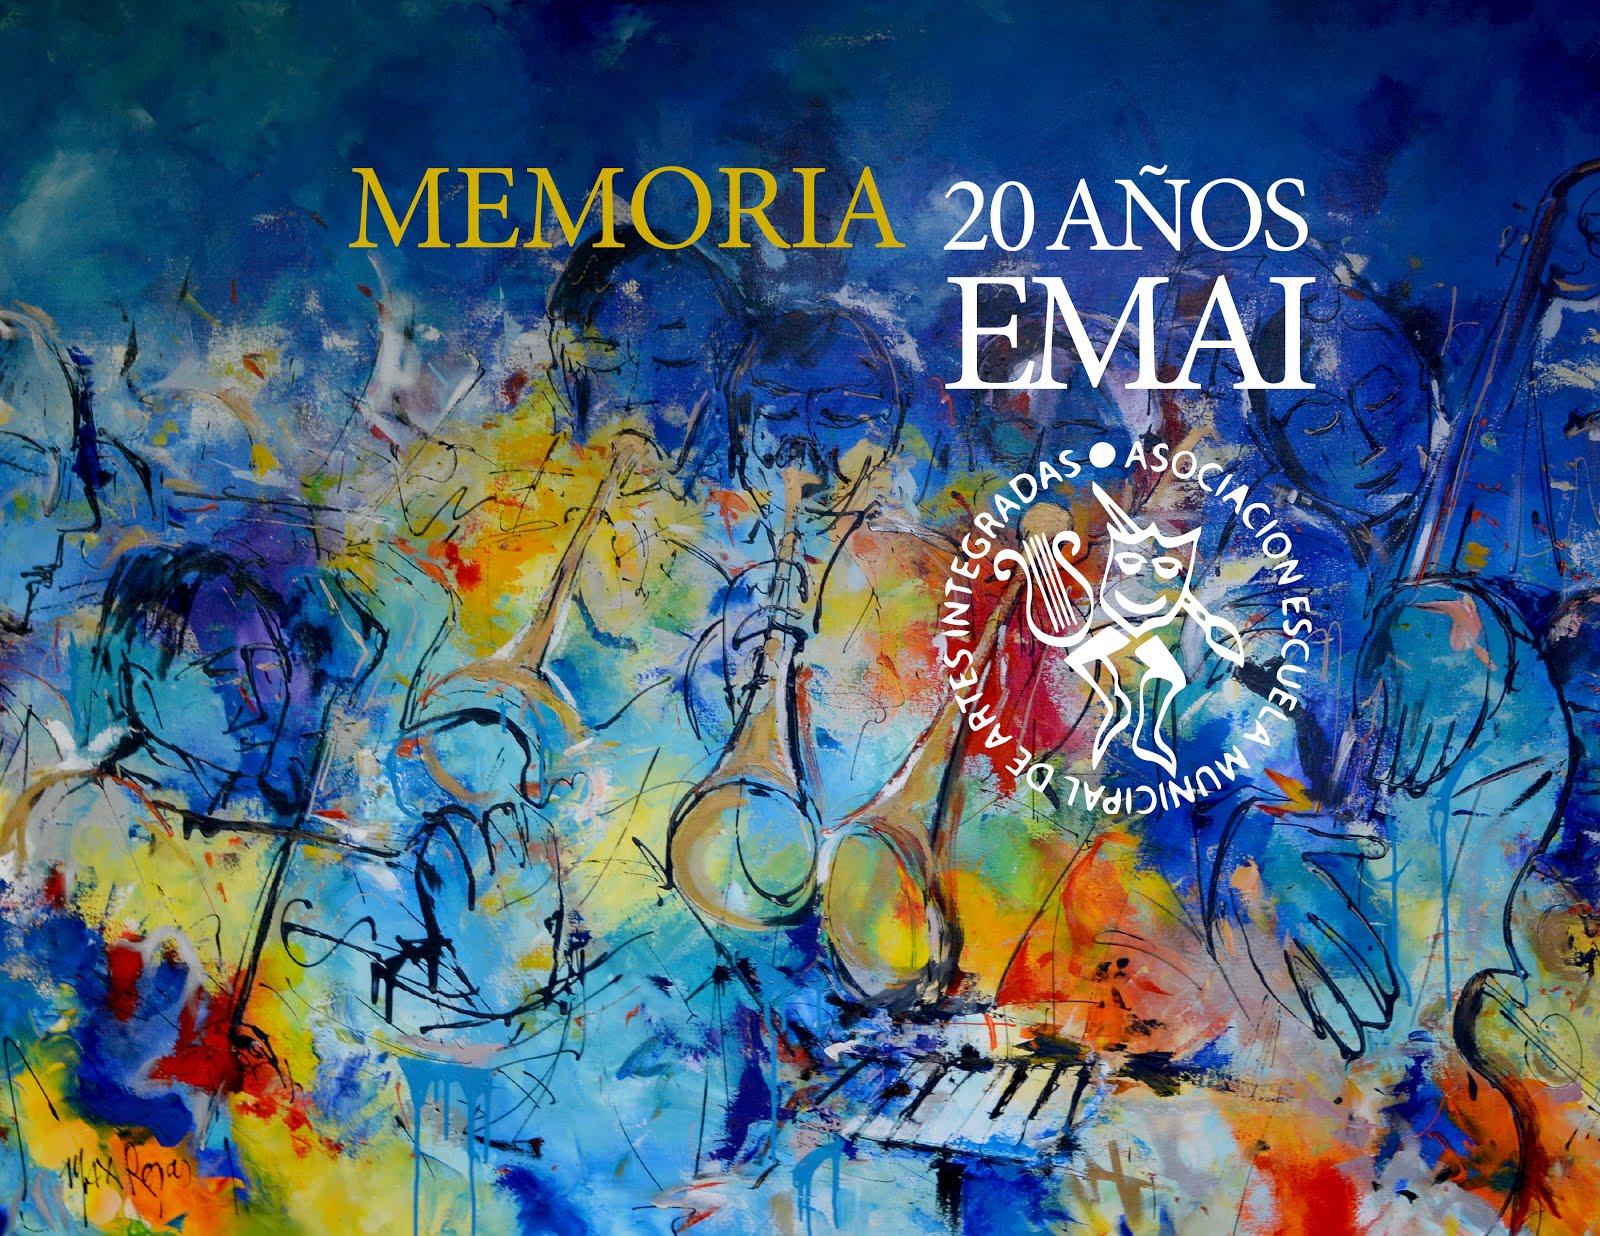 Memoria 20 años EMAI